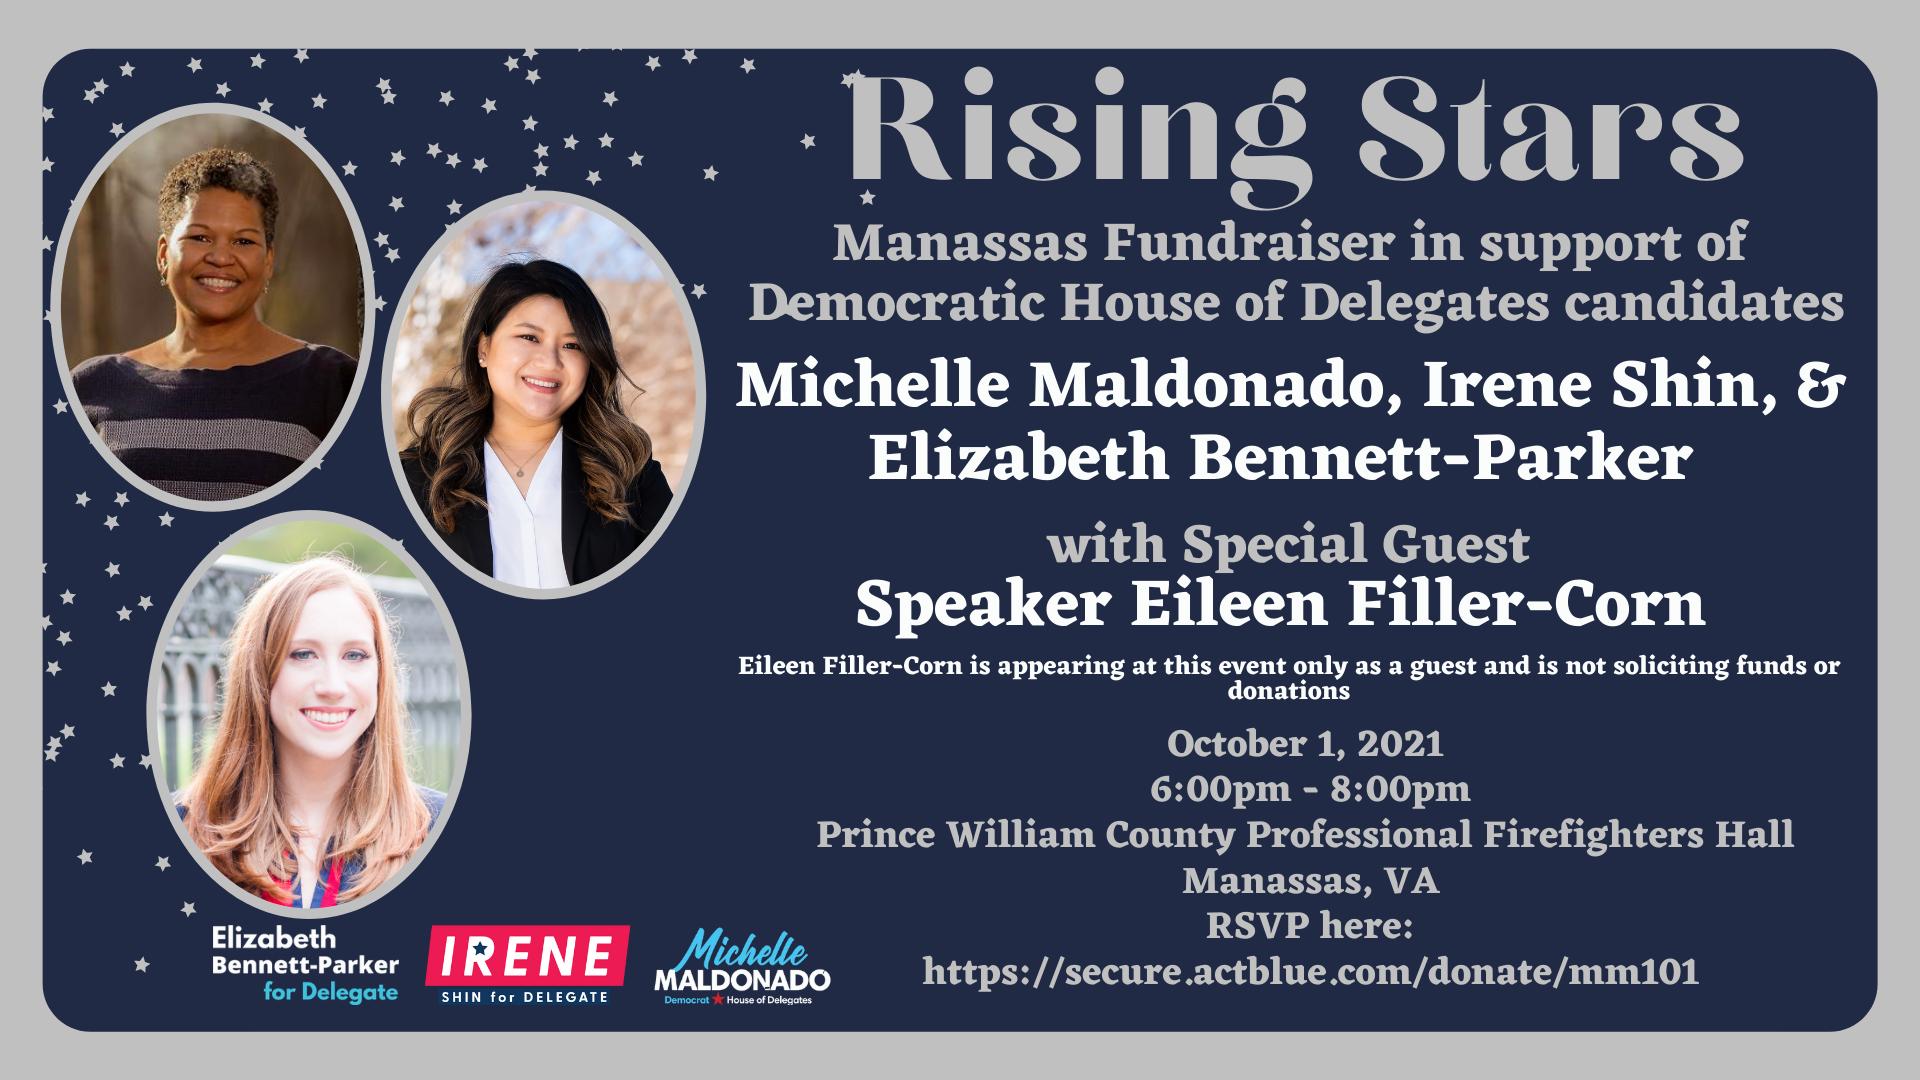 Michelle Maldonado Irene Shin Elizabeth Bennett-Parker Rising Stars